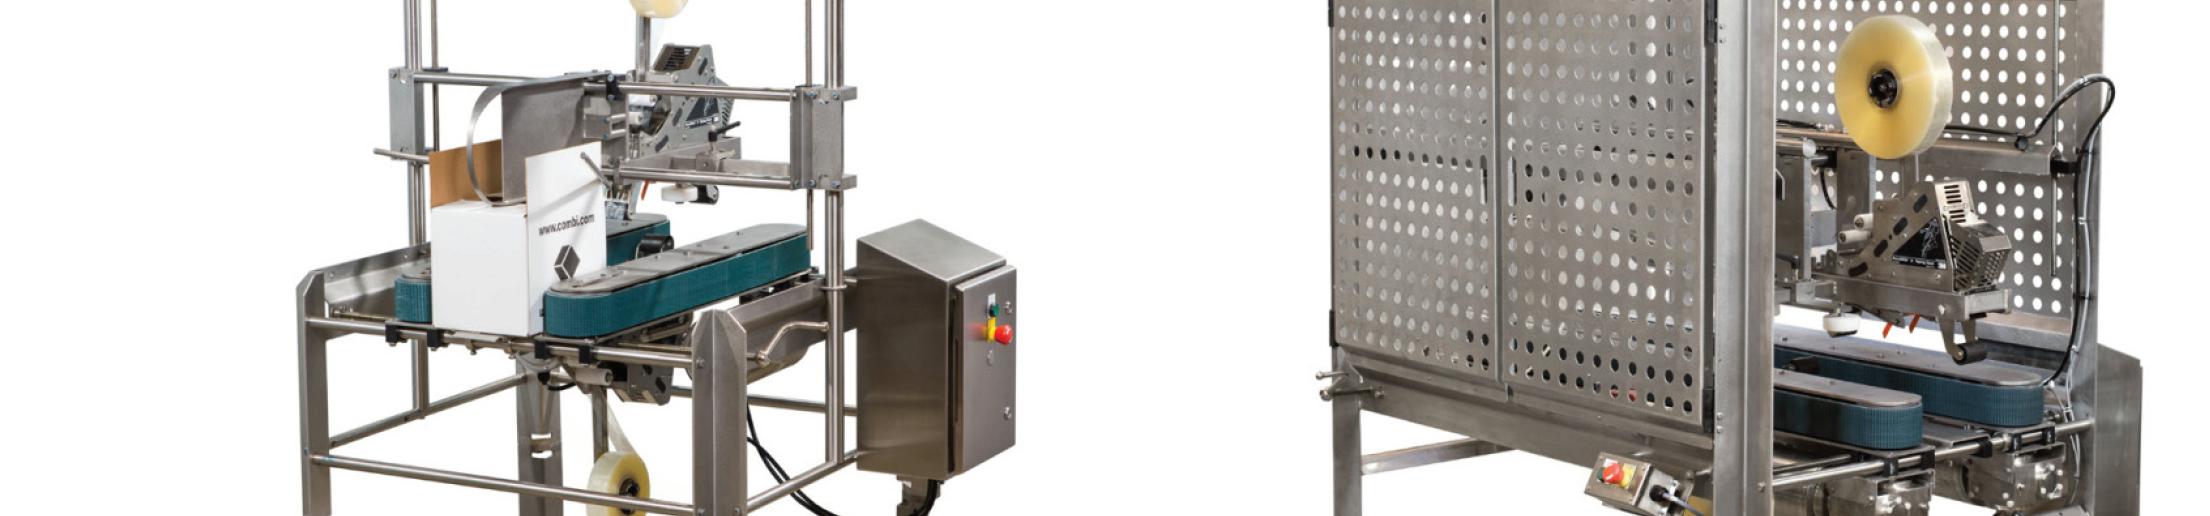 tape machines carton sealing equipment